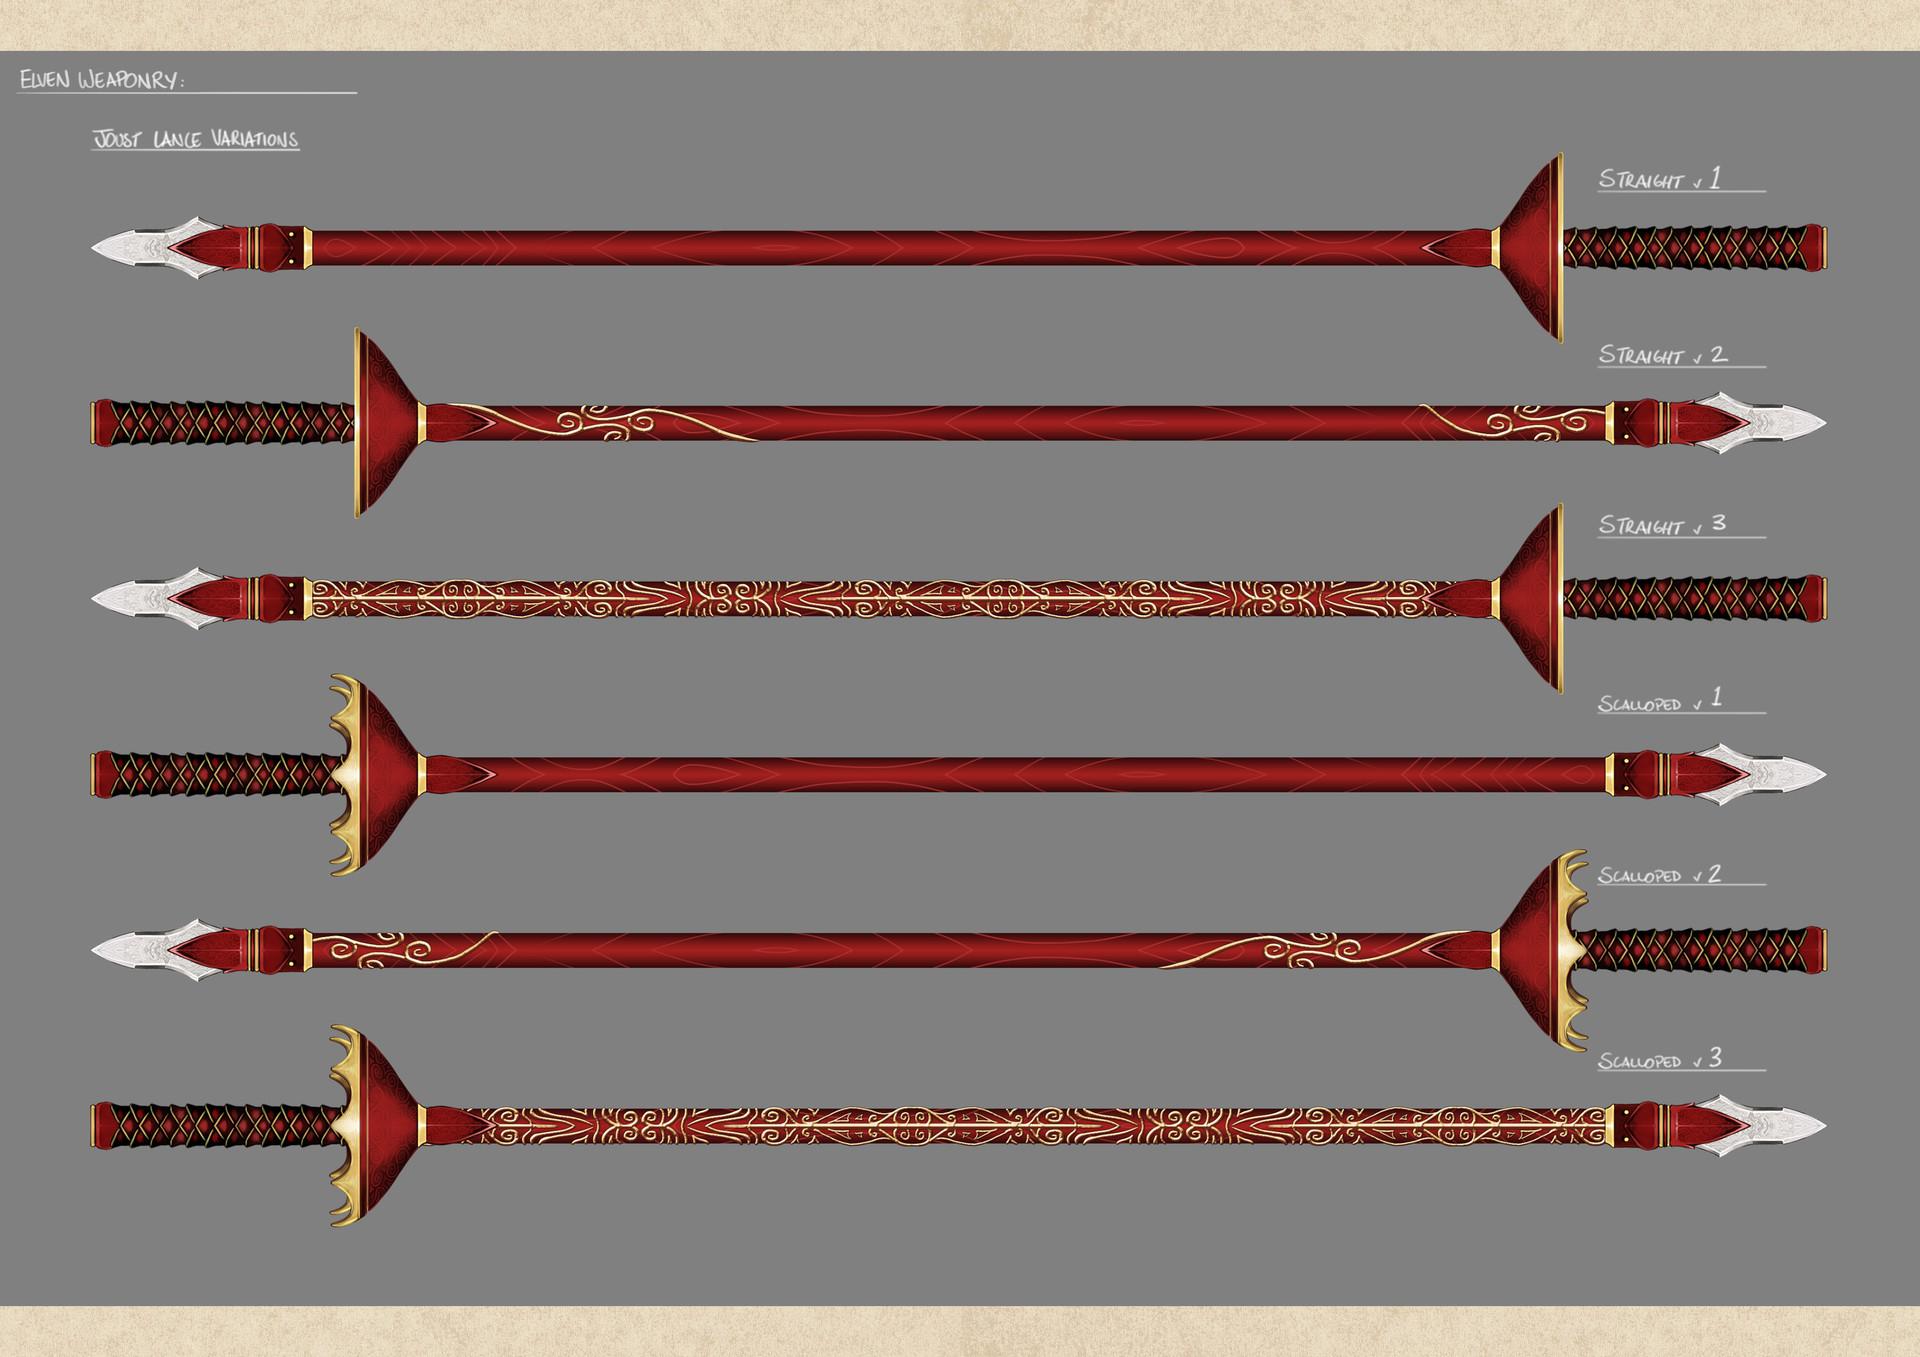 Tudor morris 03 elf weapons